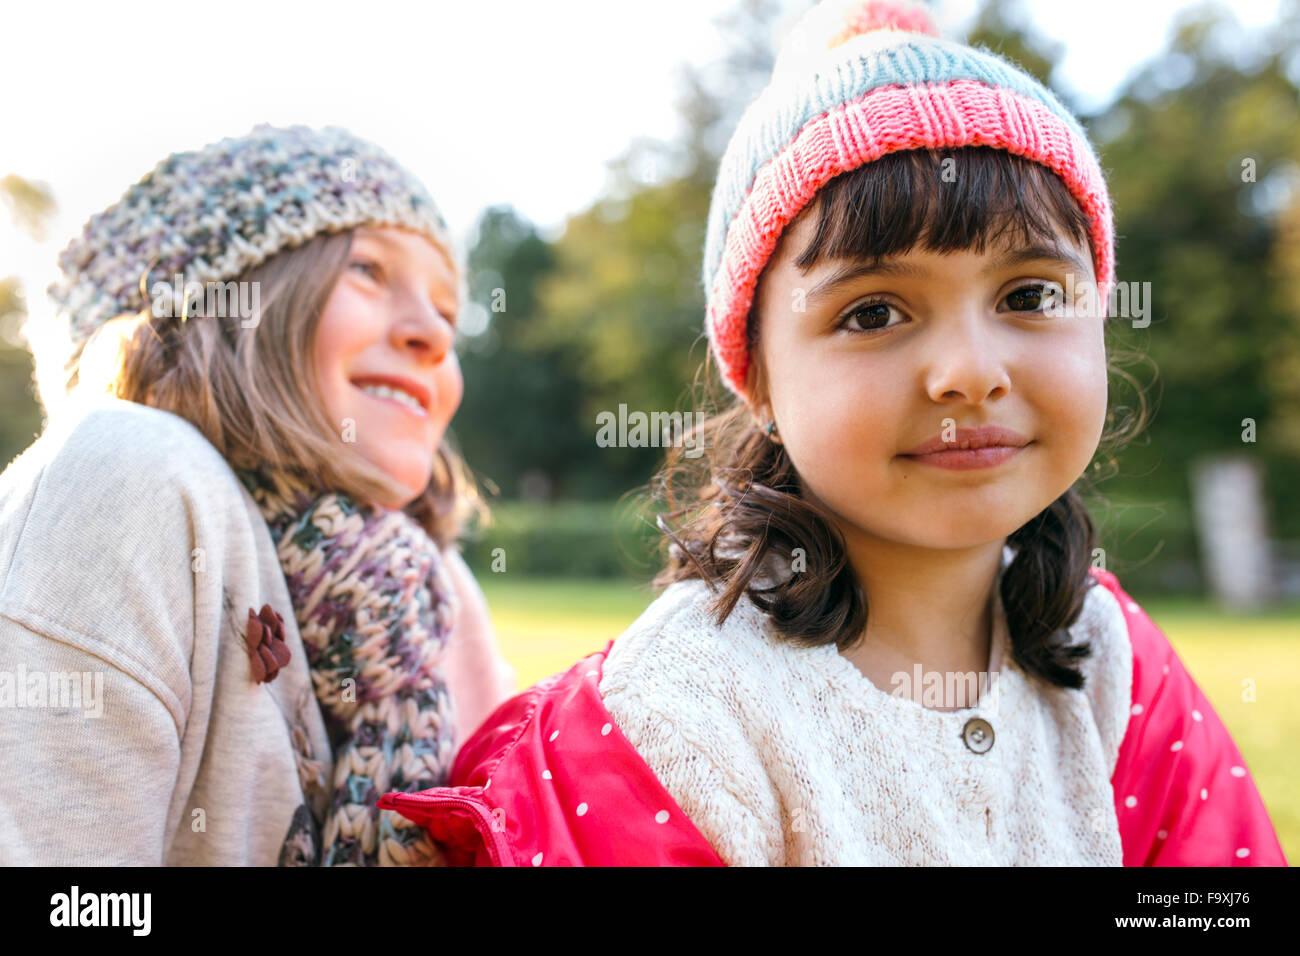 Two little girls wearing woolly hats - Stock Image